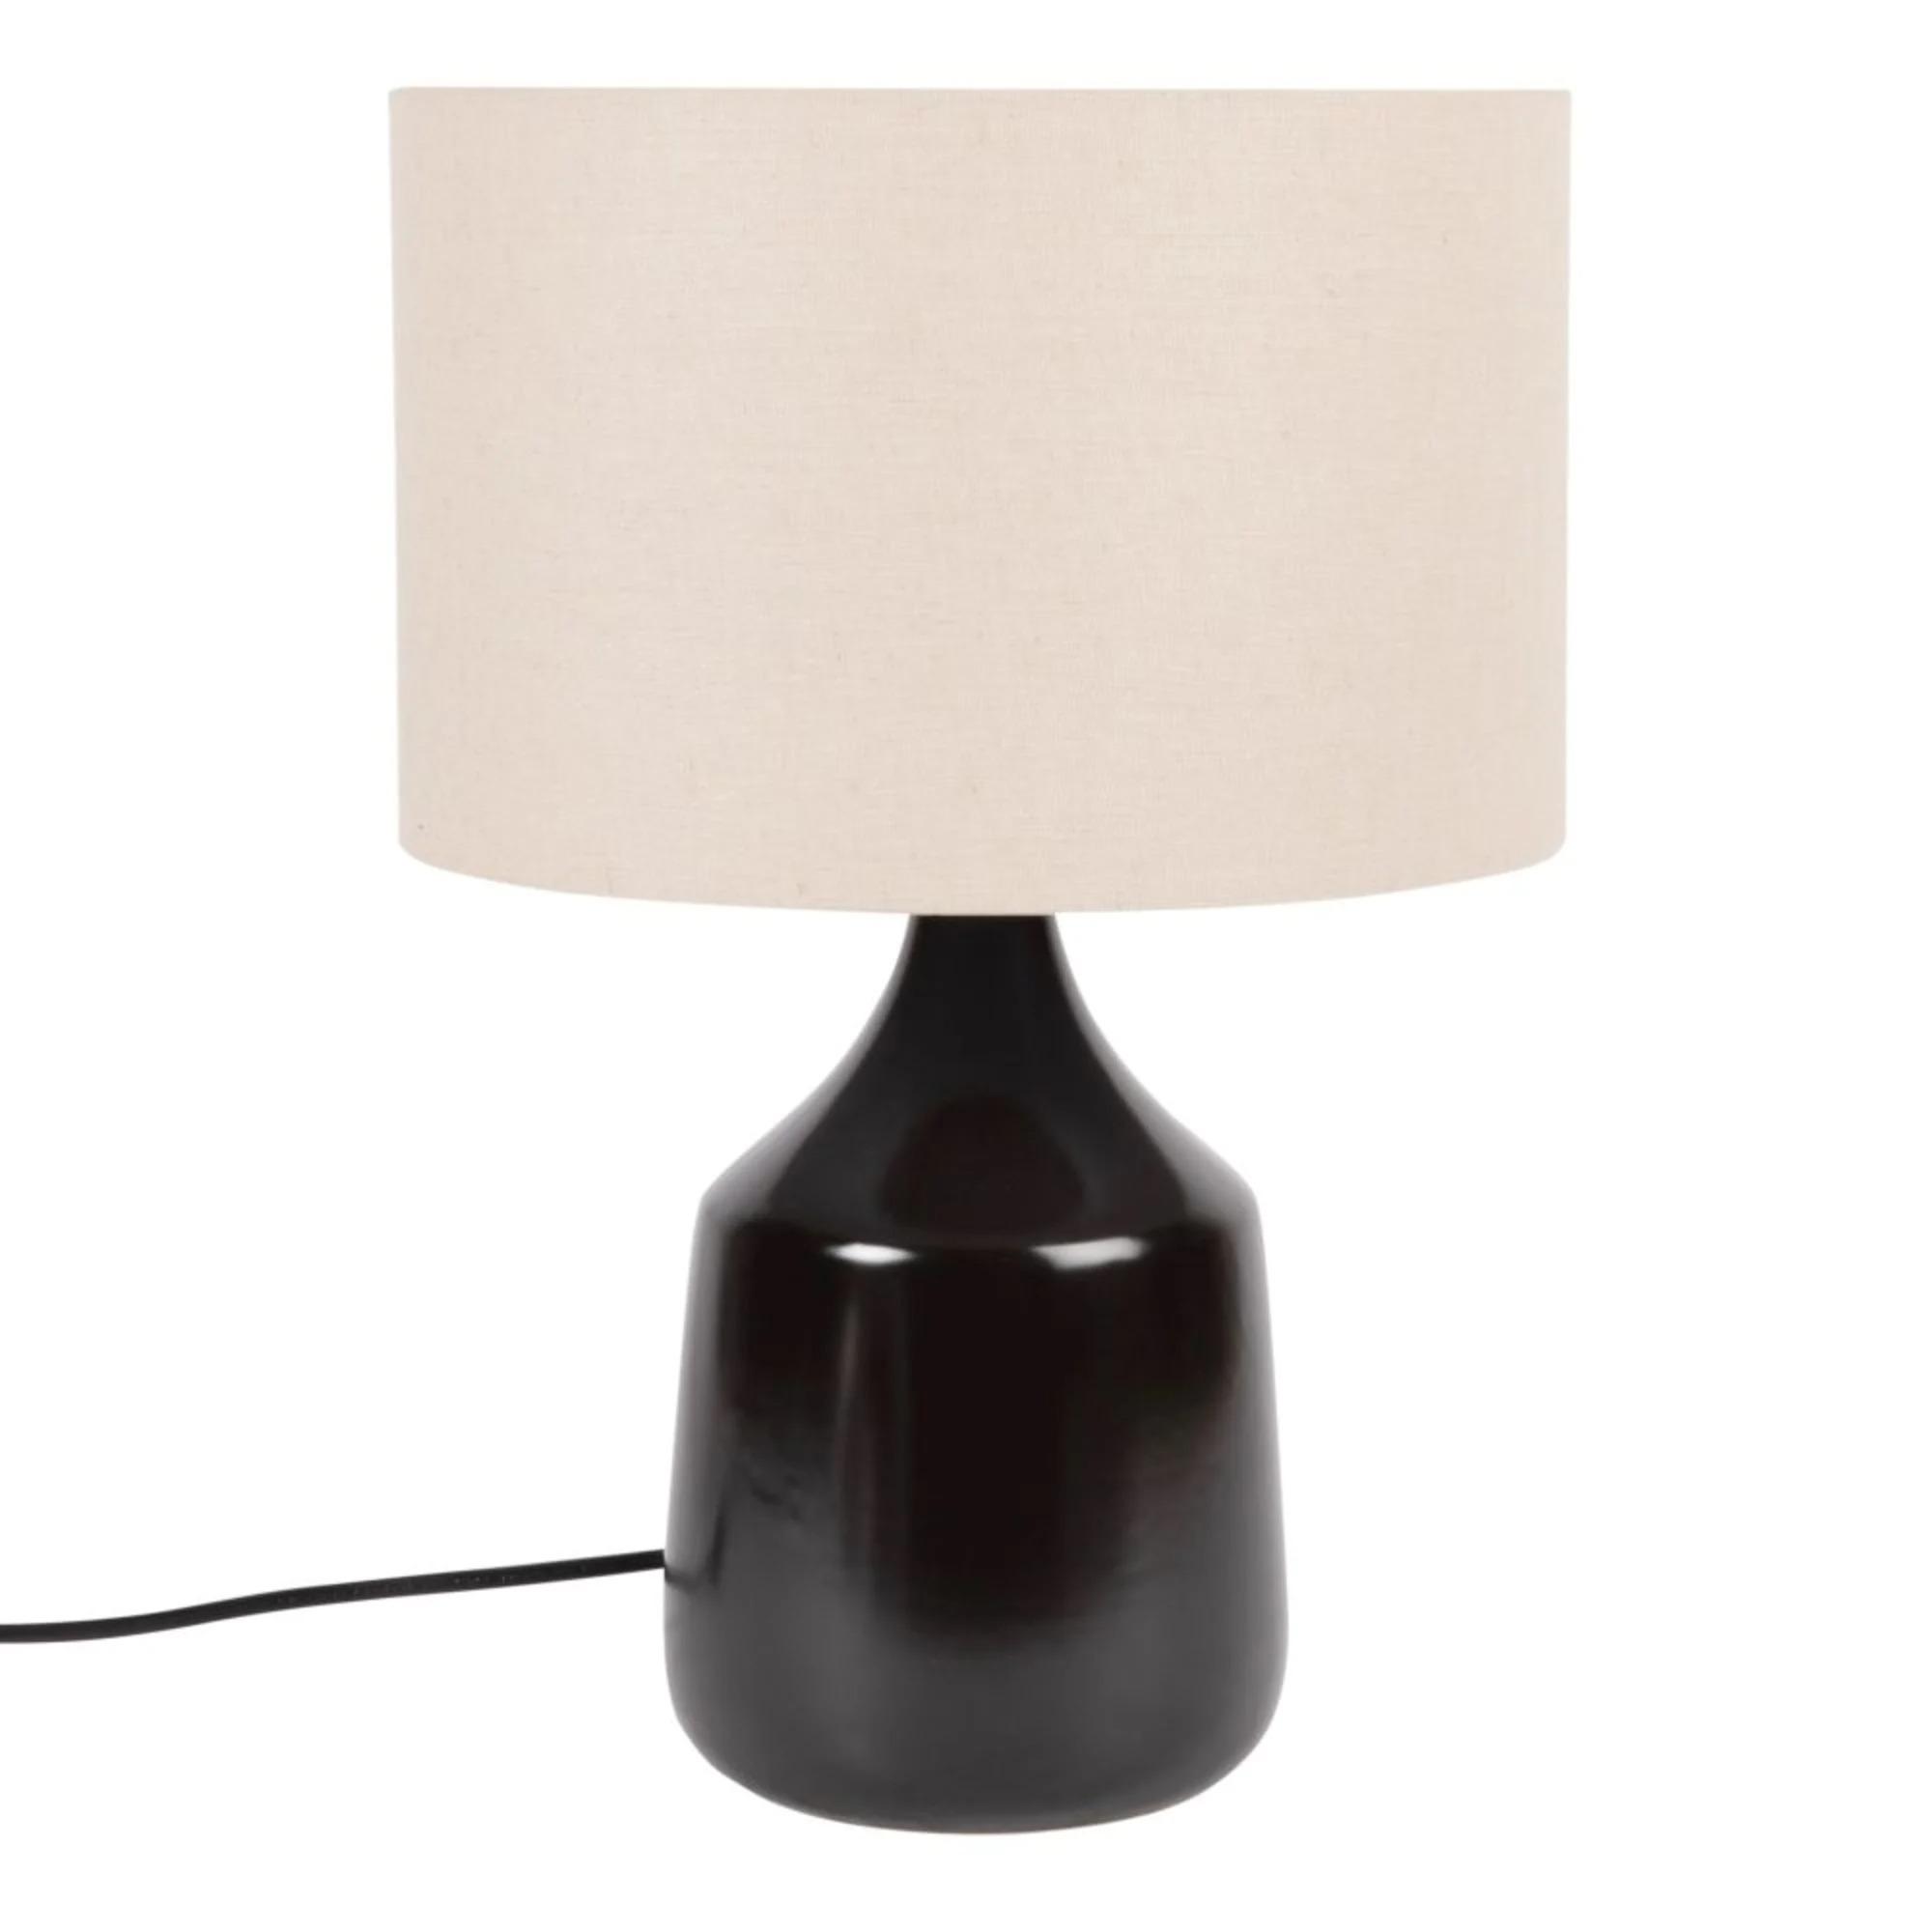 Lámpara de cerámica negra con pantalla de lino.